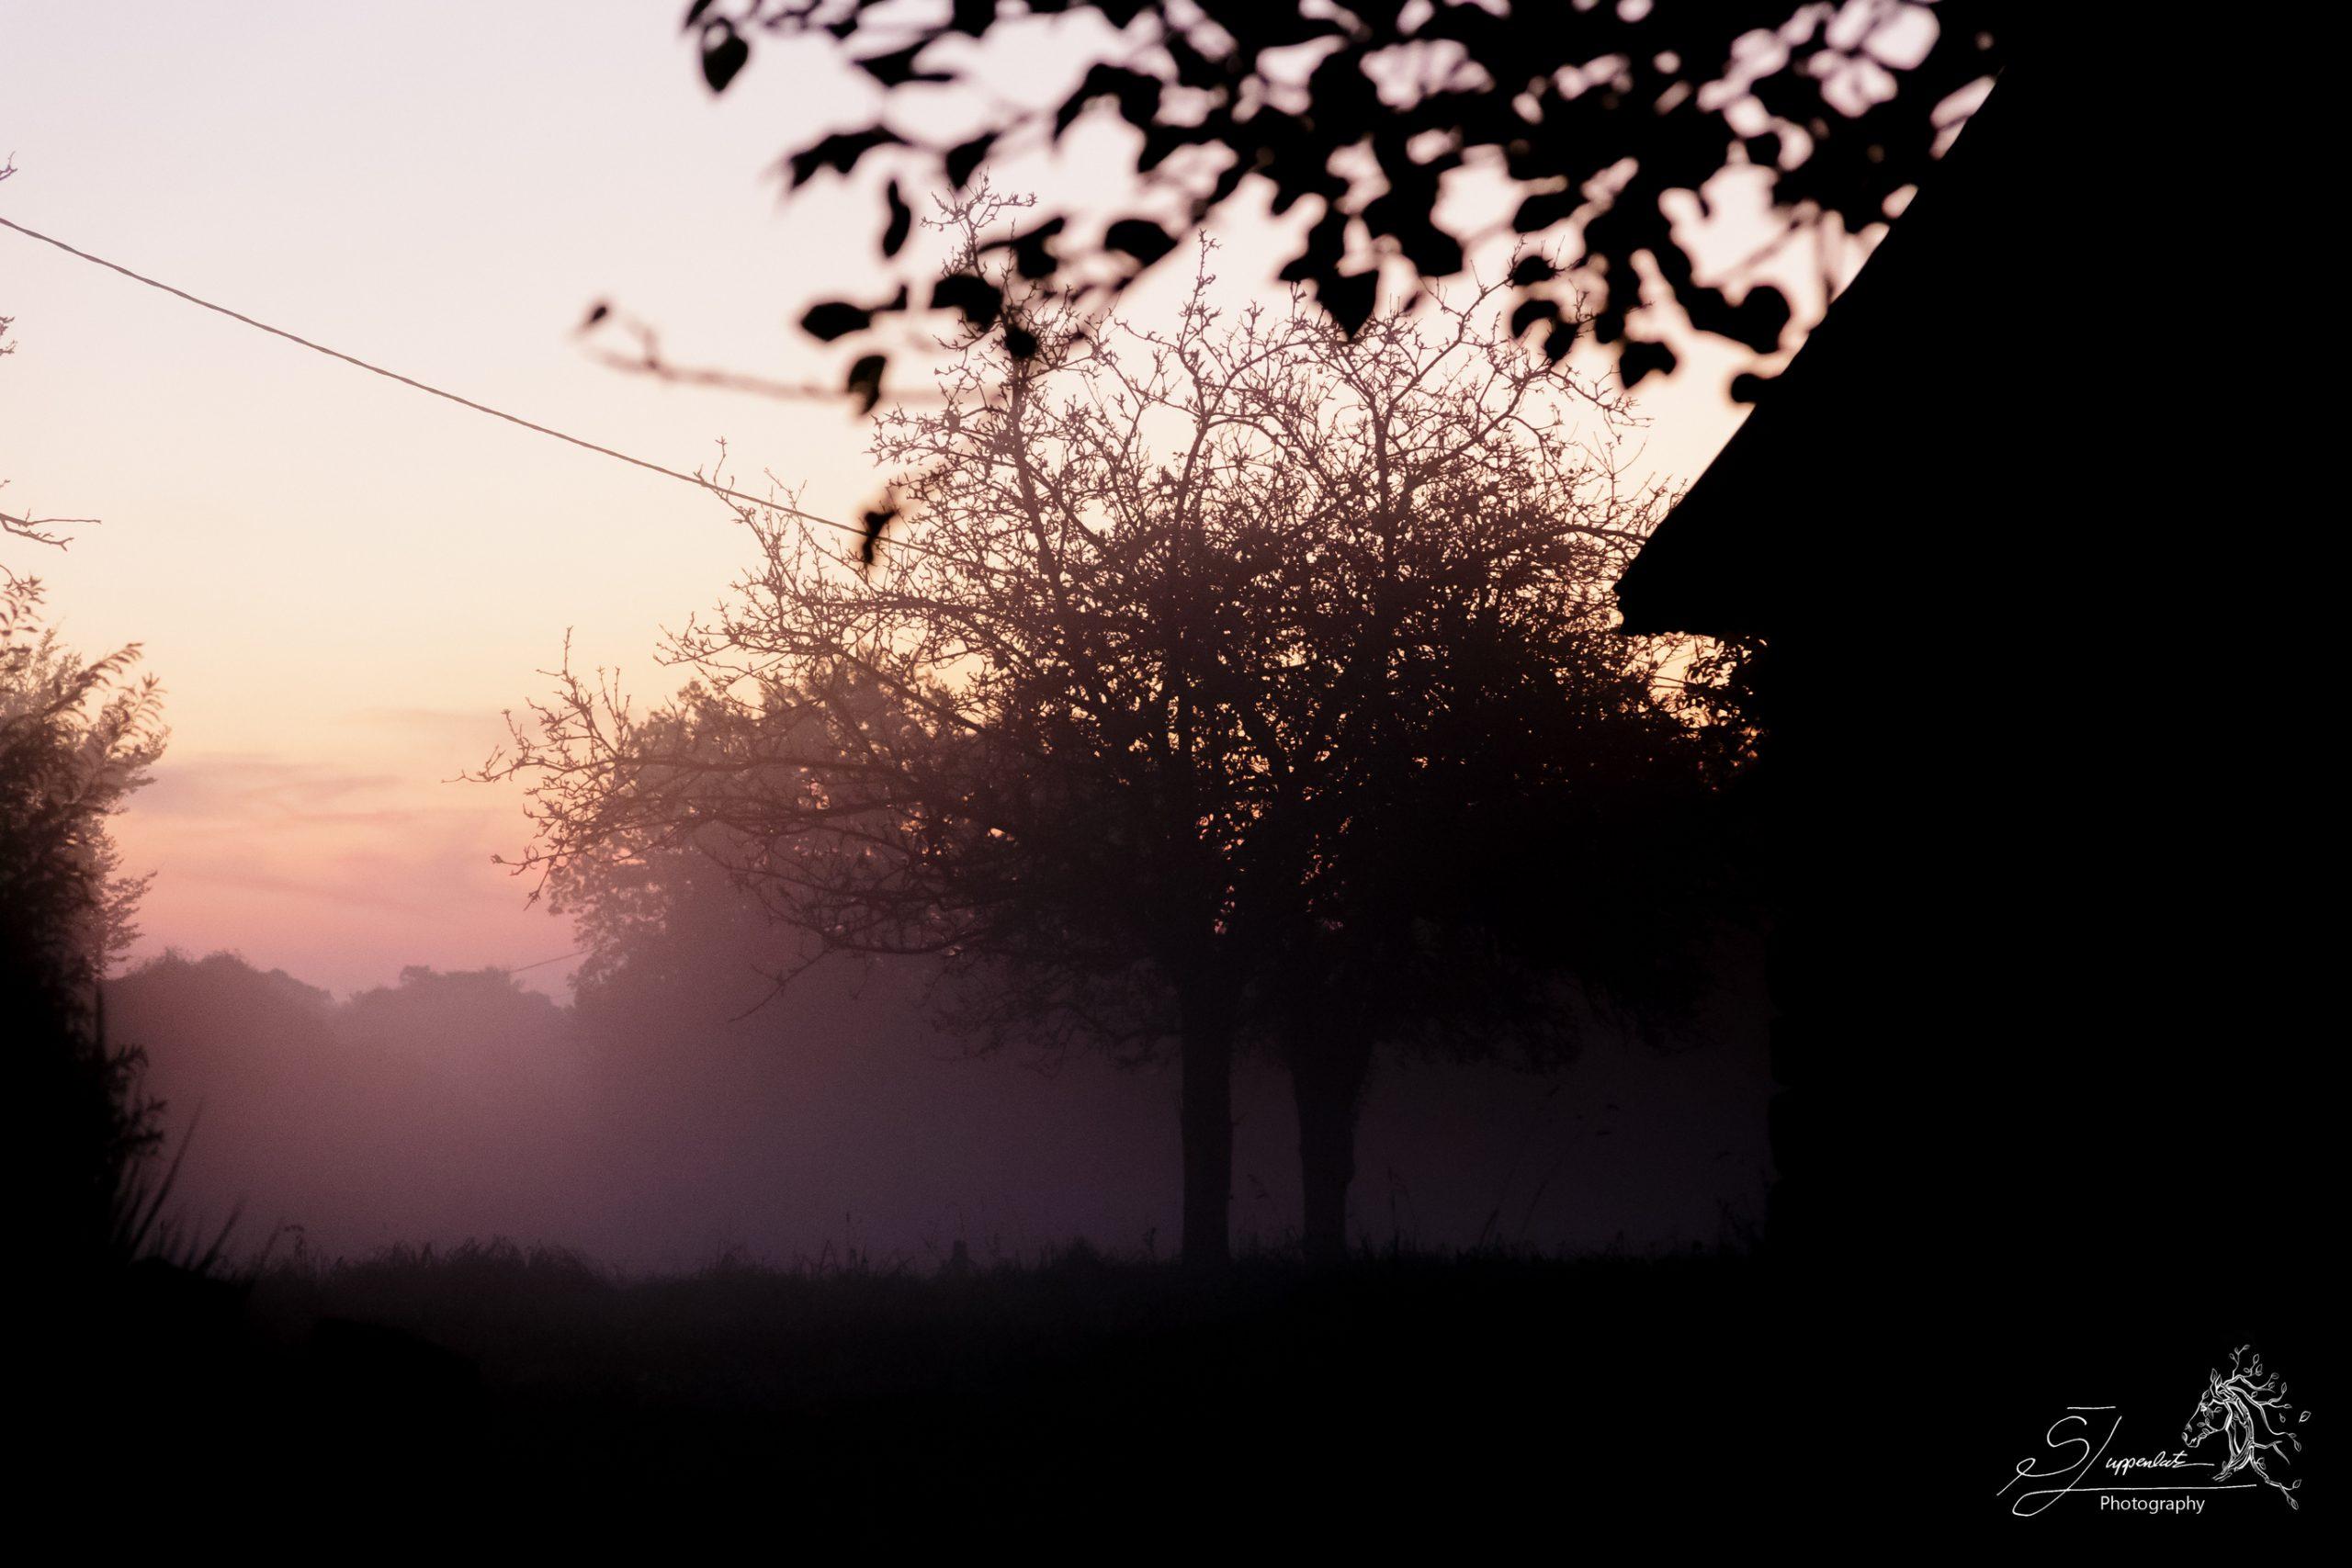 Misty Morning Light Through The Trees